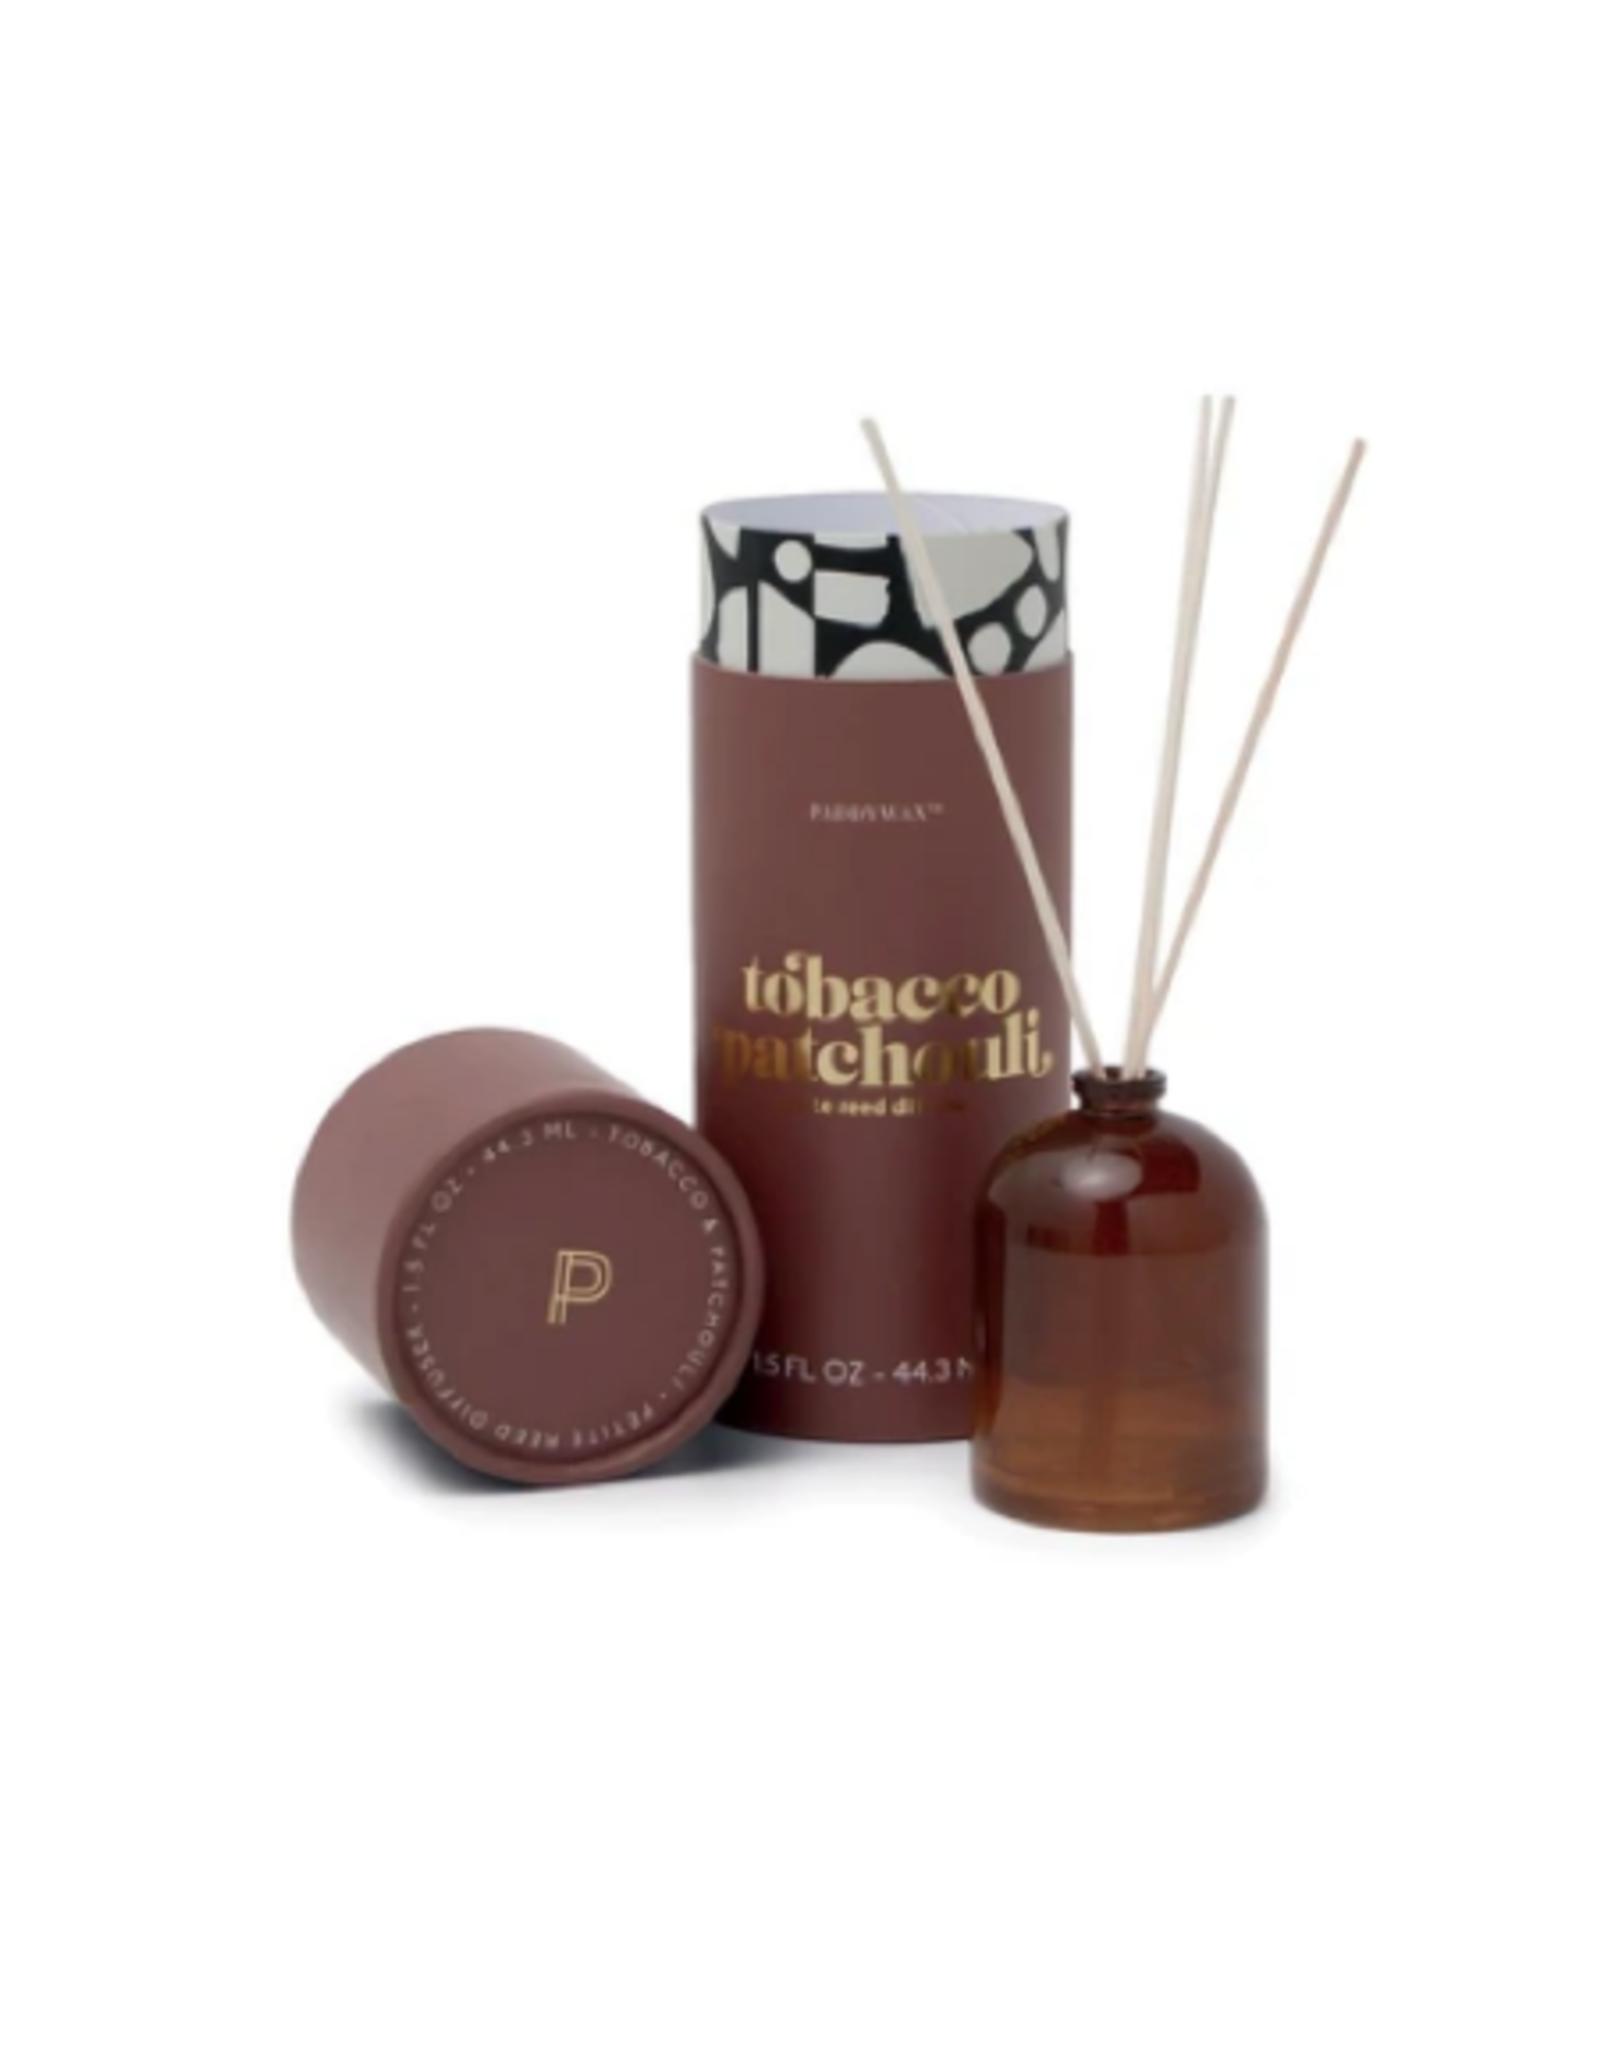 PAX - Mini Diffuser Set/Tobacco Patchouli 1.5oz